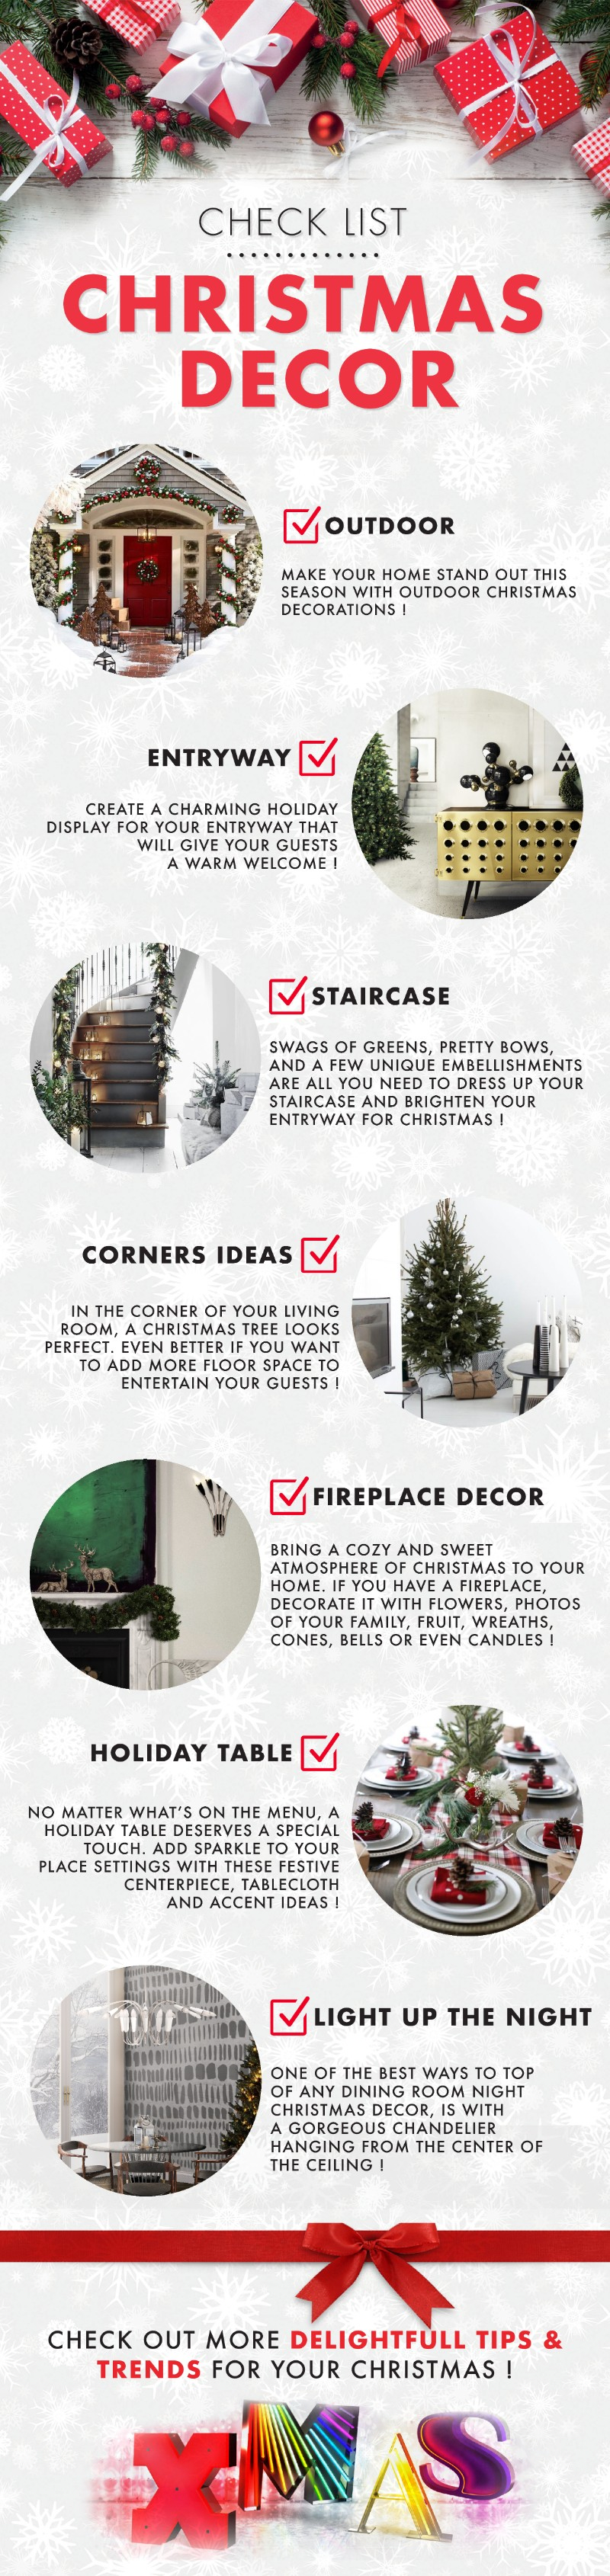 christmas 2017 gift guide for design lovers 8 christmas 2017 gift guide christmas 2017 gift guide